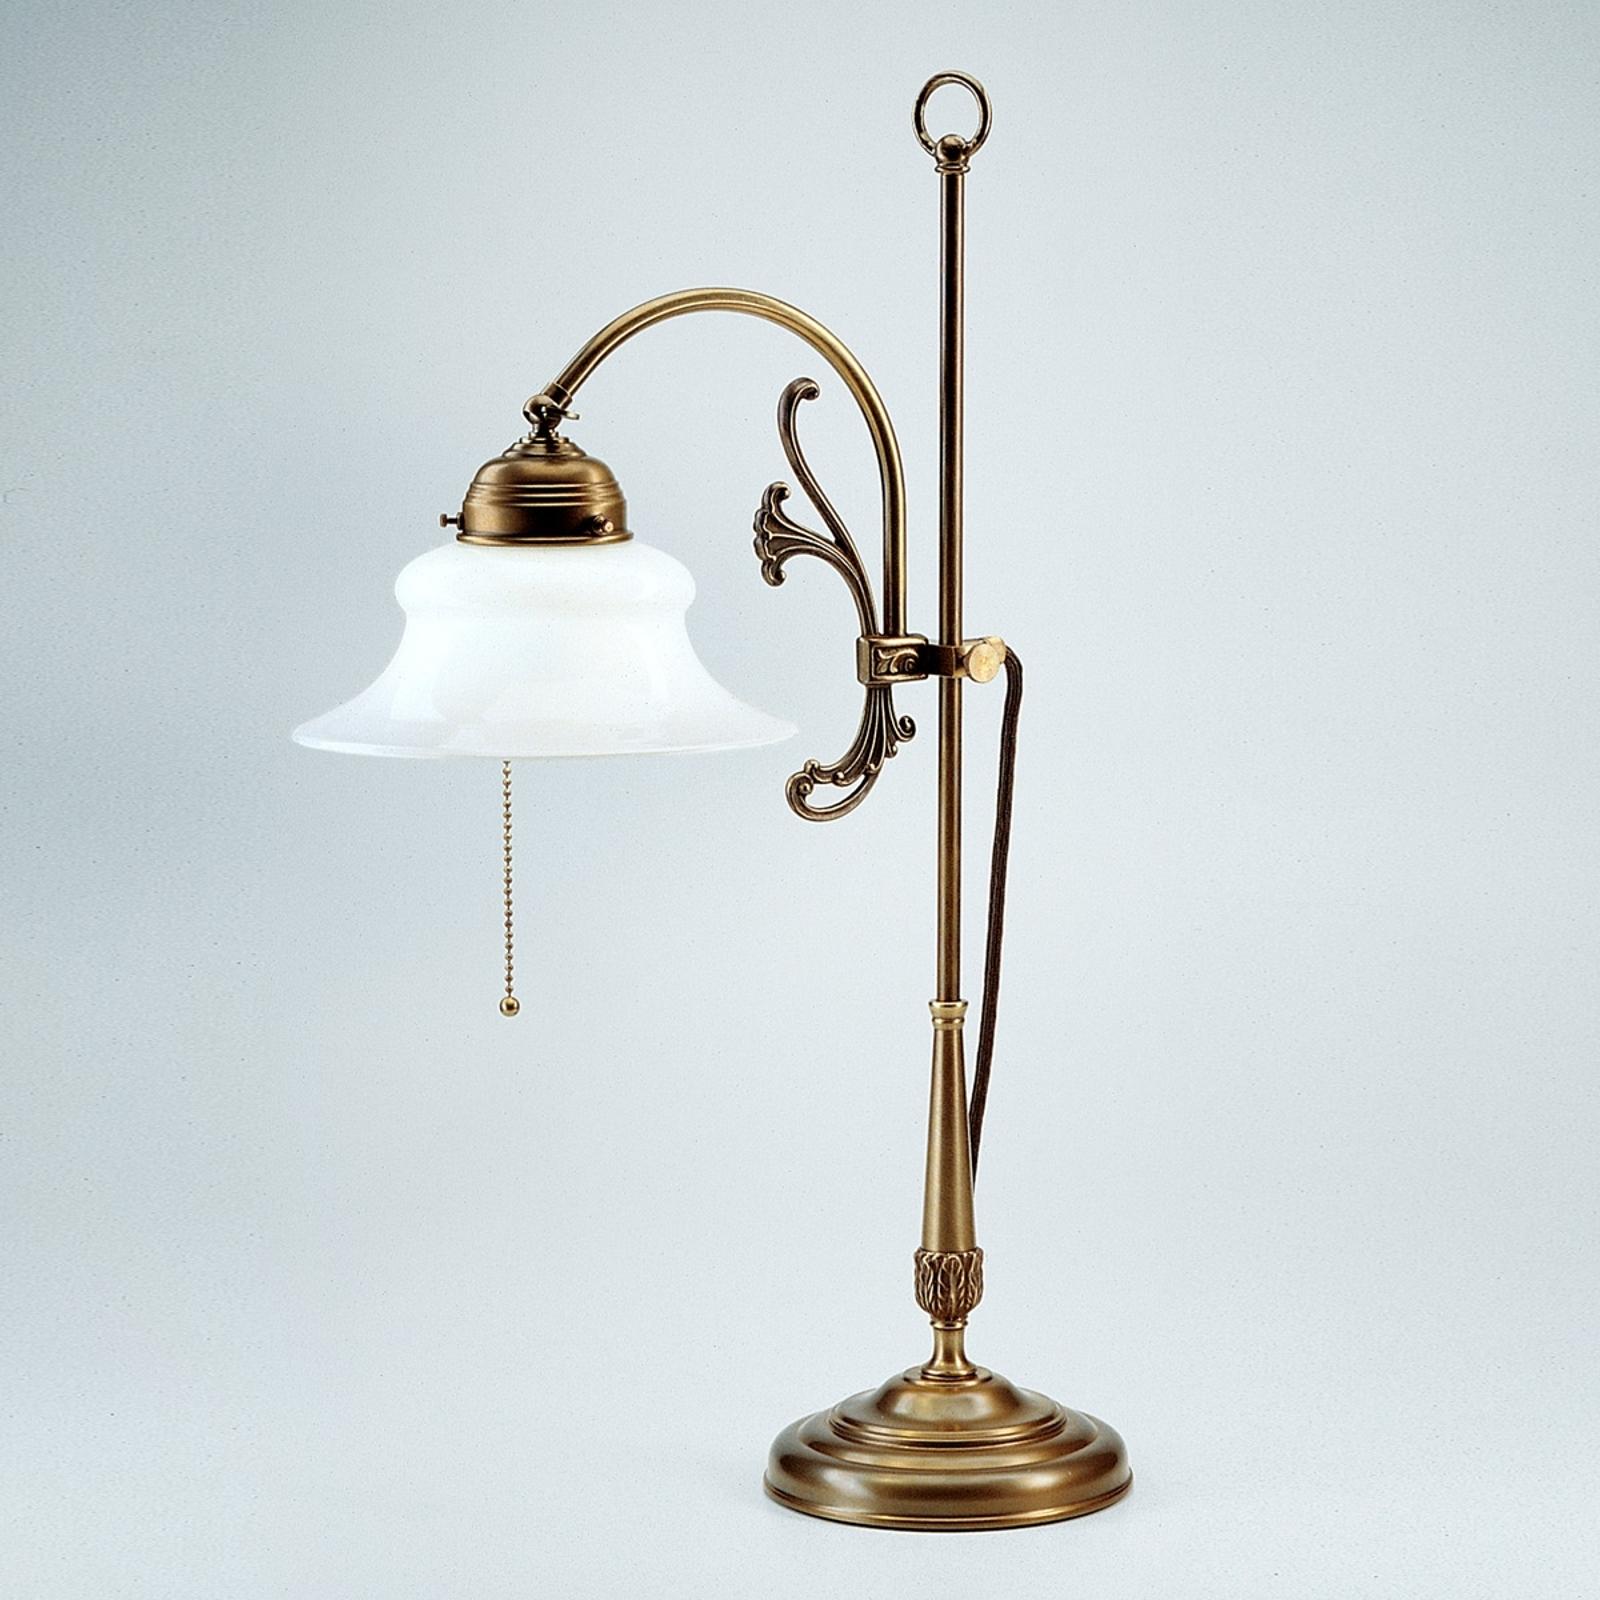 Elisabeth intricate table lamp_1542055_1